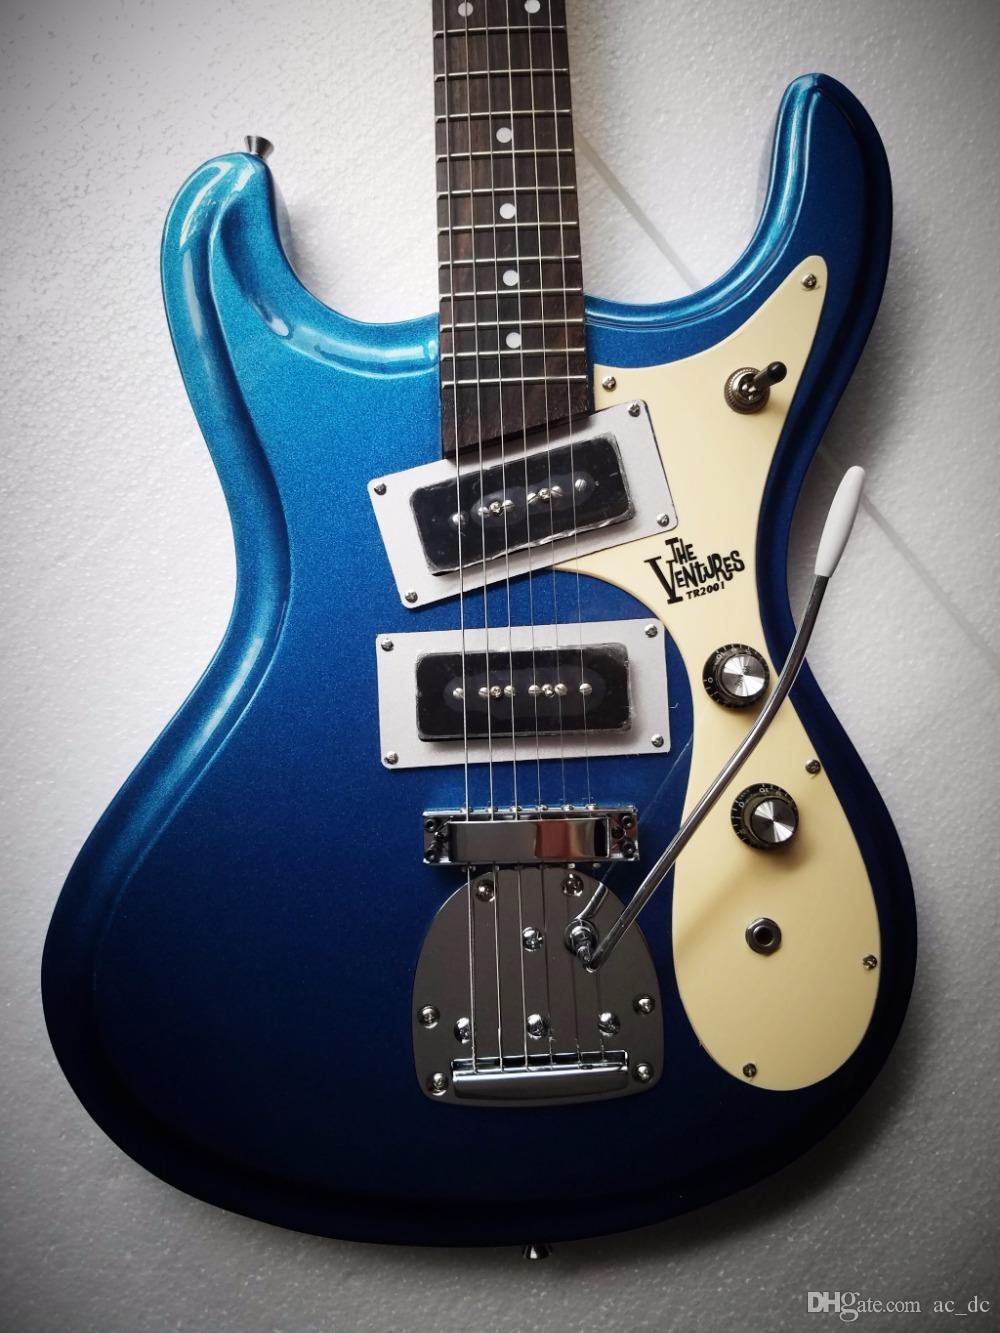 Mosrite Guitars History Guitar Wiring Diagram Rare Johnny Ramone Signature Venture Metallic Blue 1000x1333